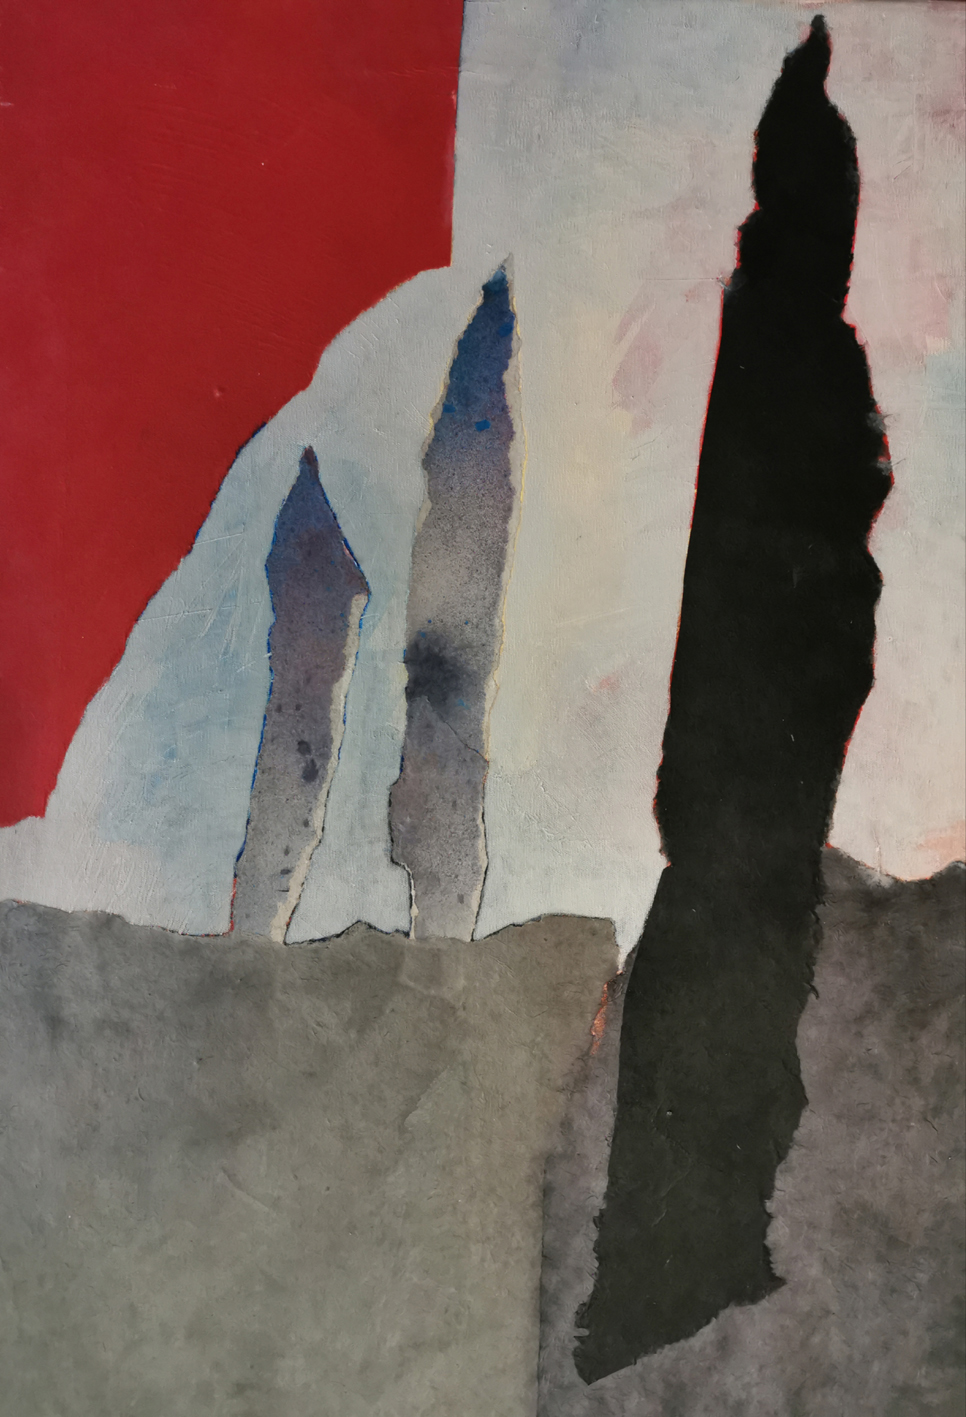 Paisajes en la memoria (2019) - Ana López